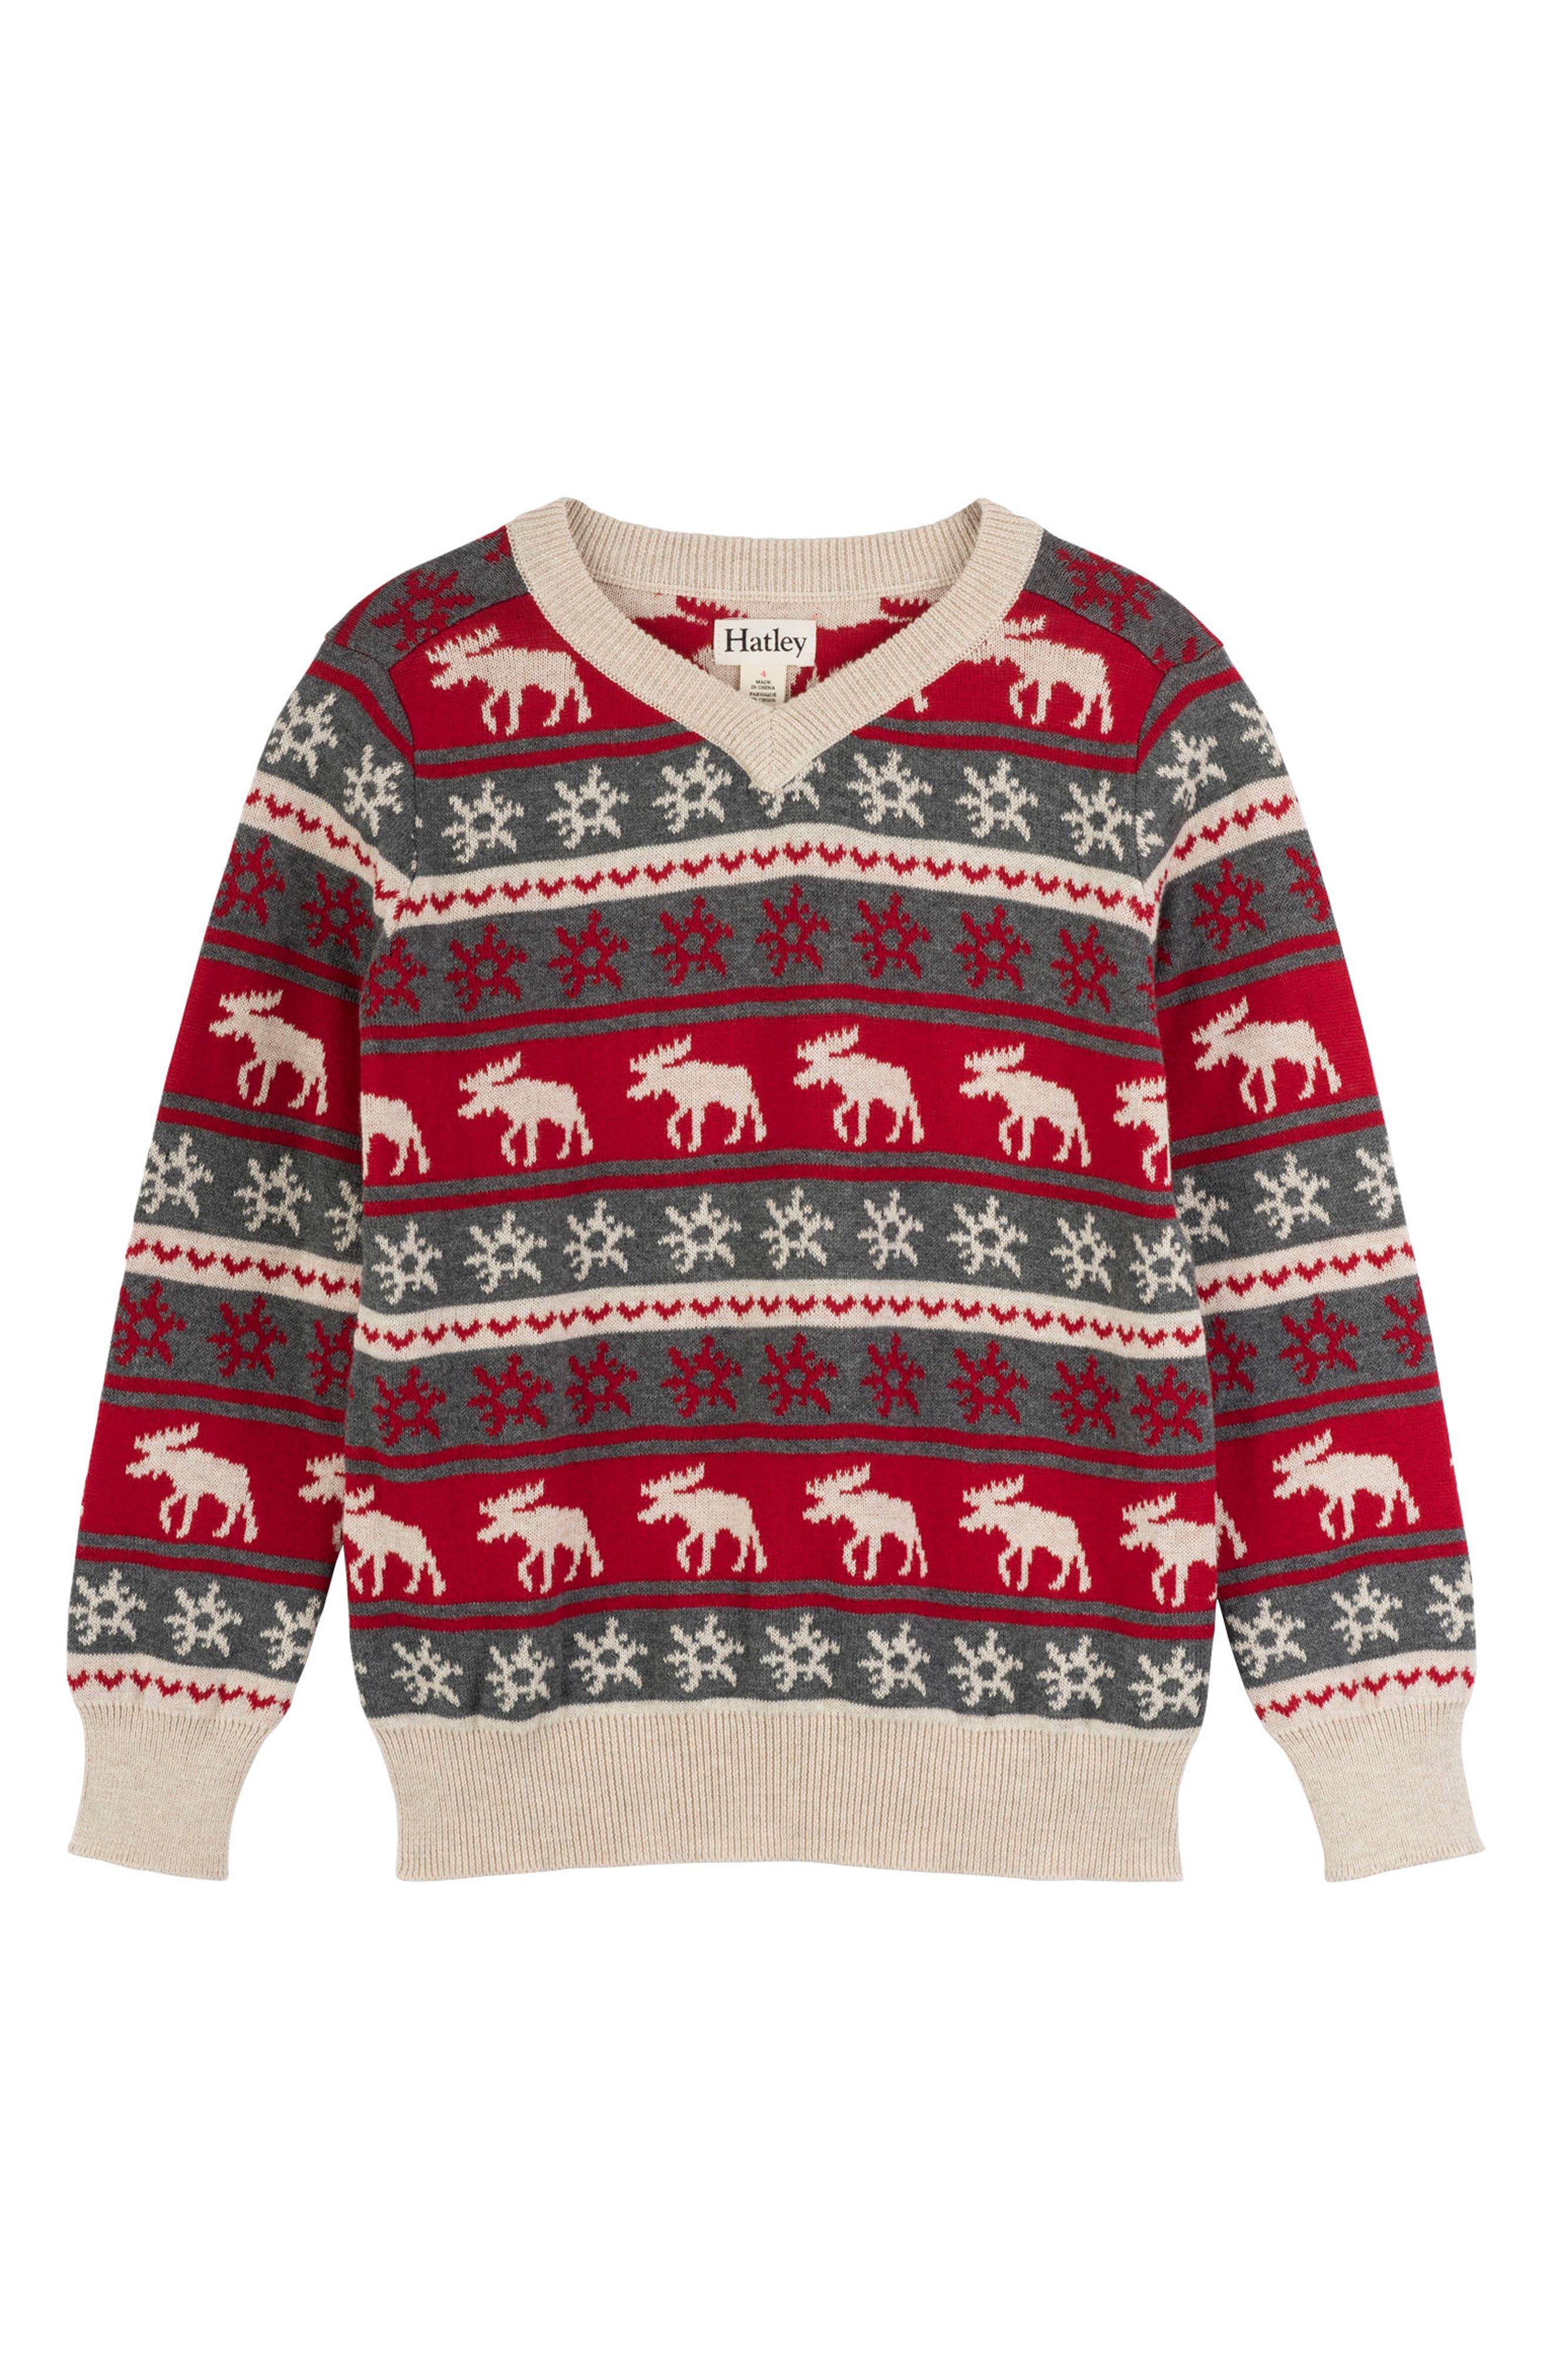 1940s Children's Clothing: Girls, Boys, Baby, Toddler Boys Hatley Fair Isle Moose Sweater $42.00 AT vintagedancer.com